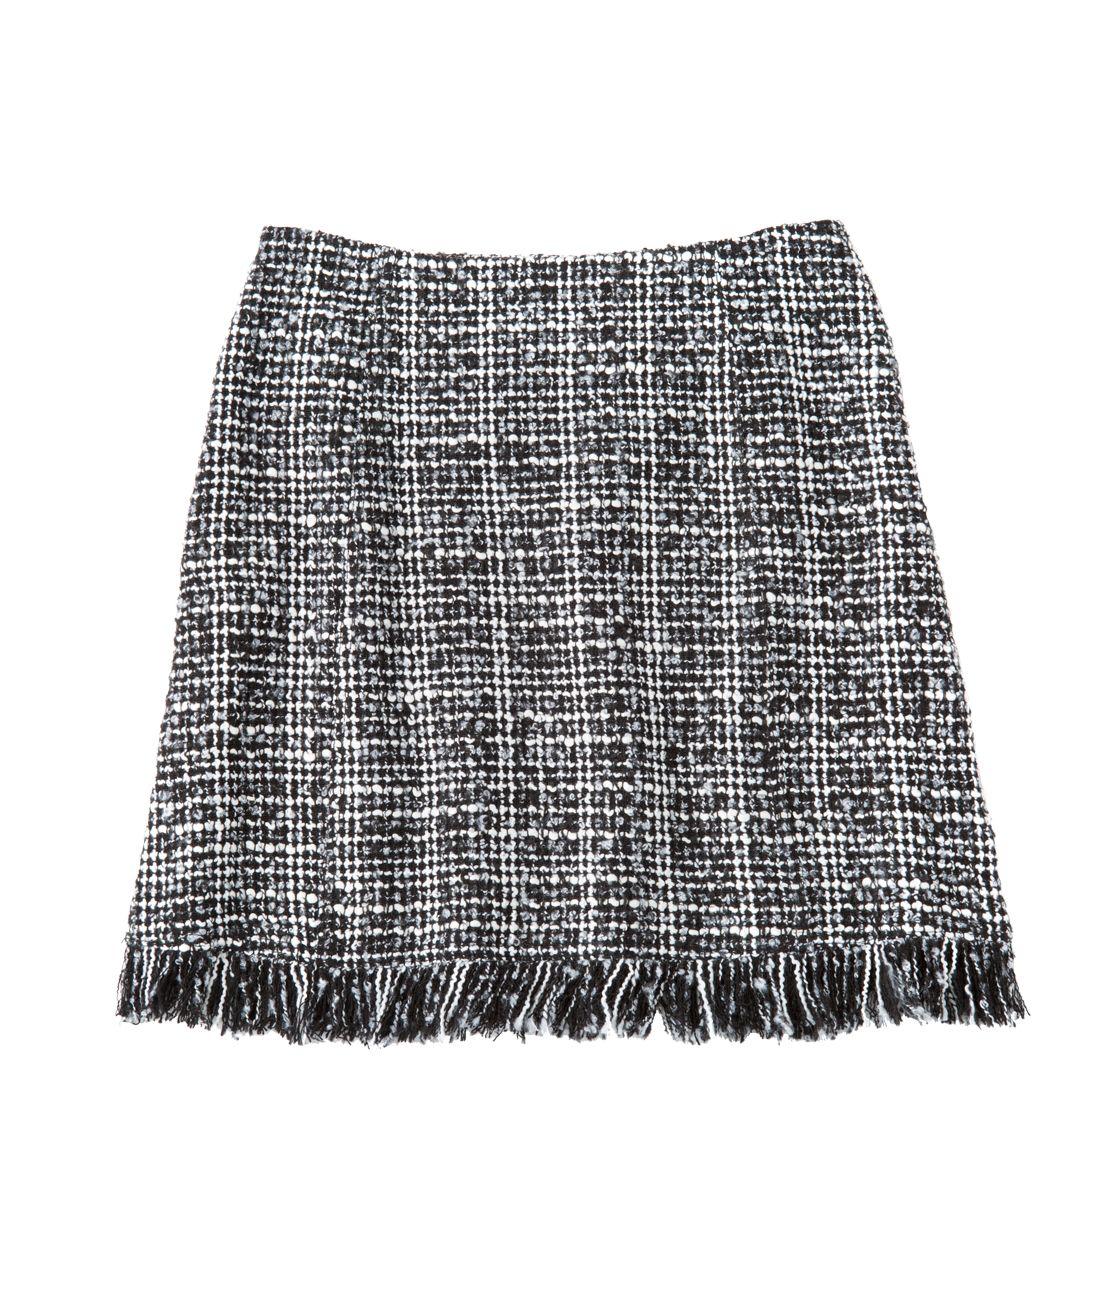 Twirdovlinzi skirt